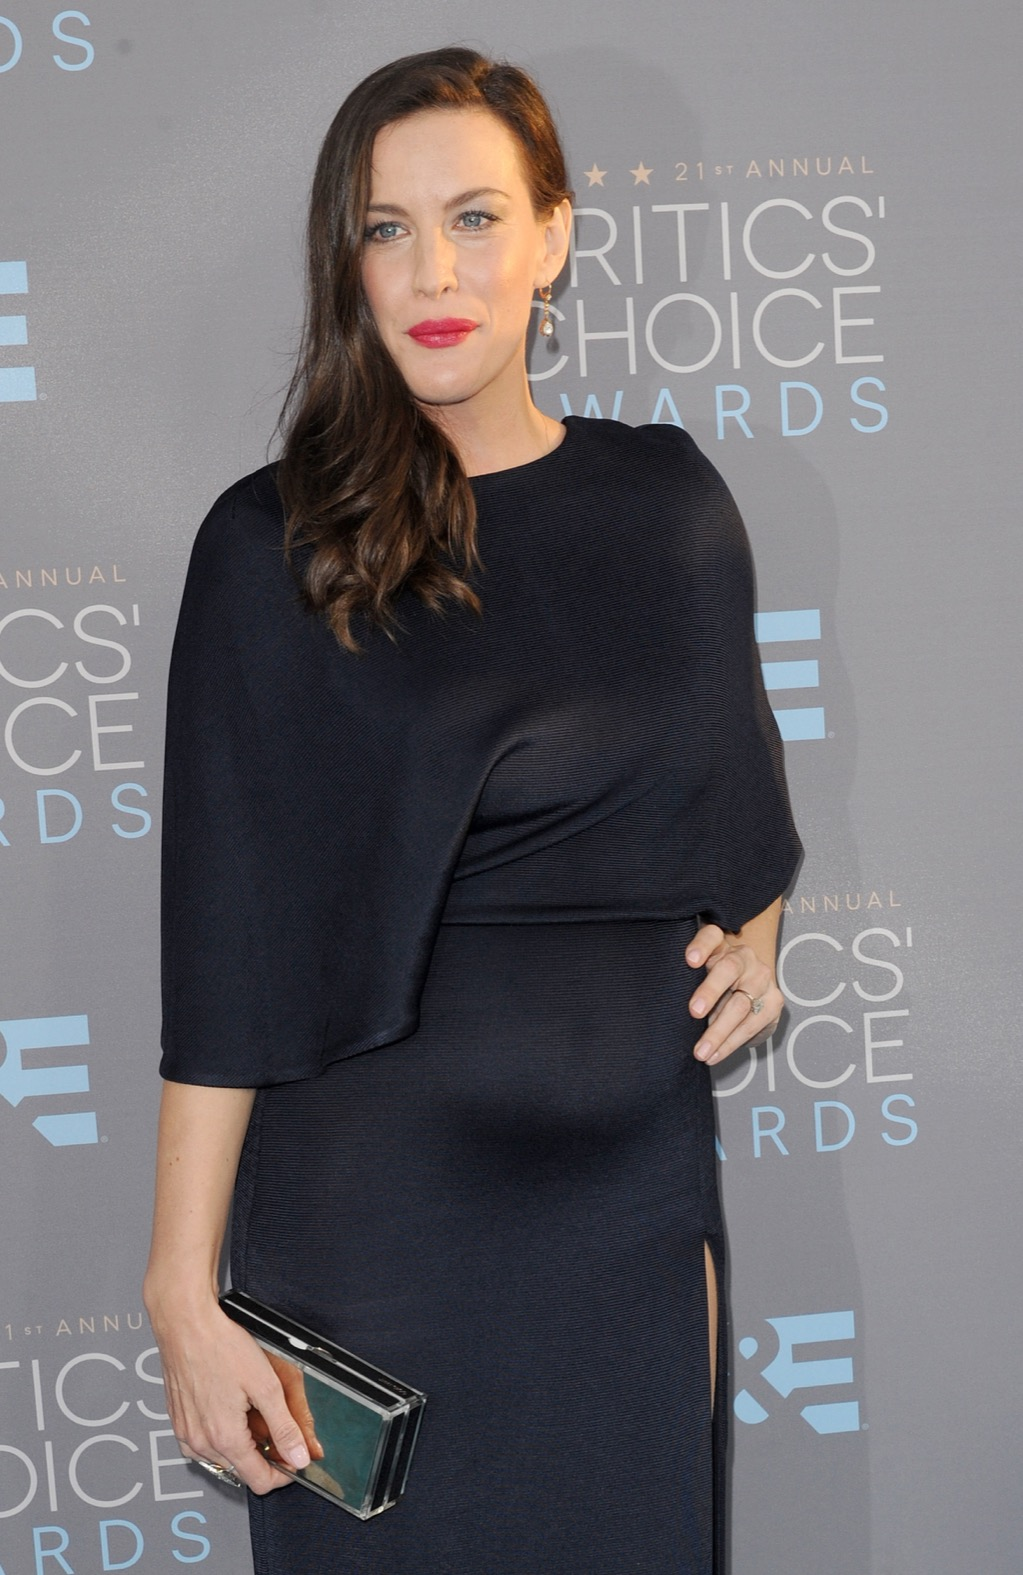 Actress Liv Tyler